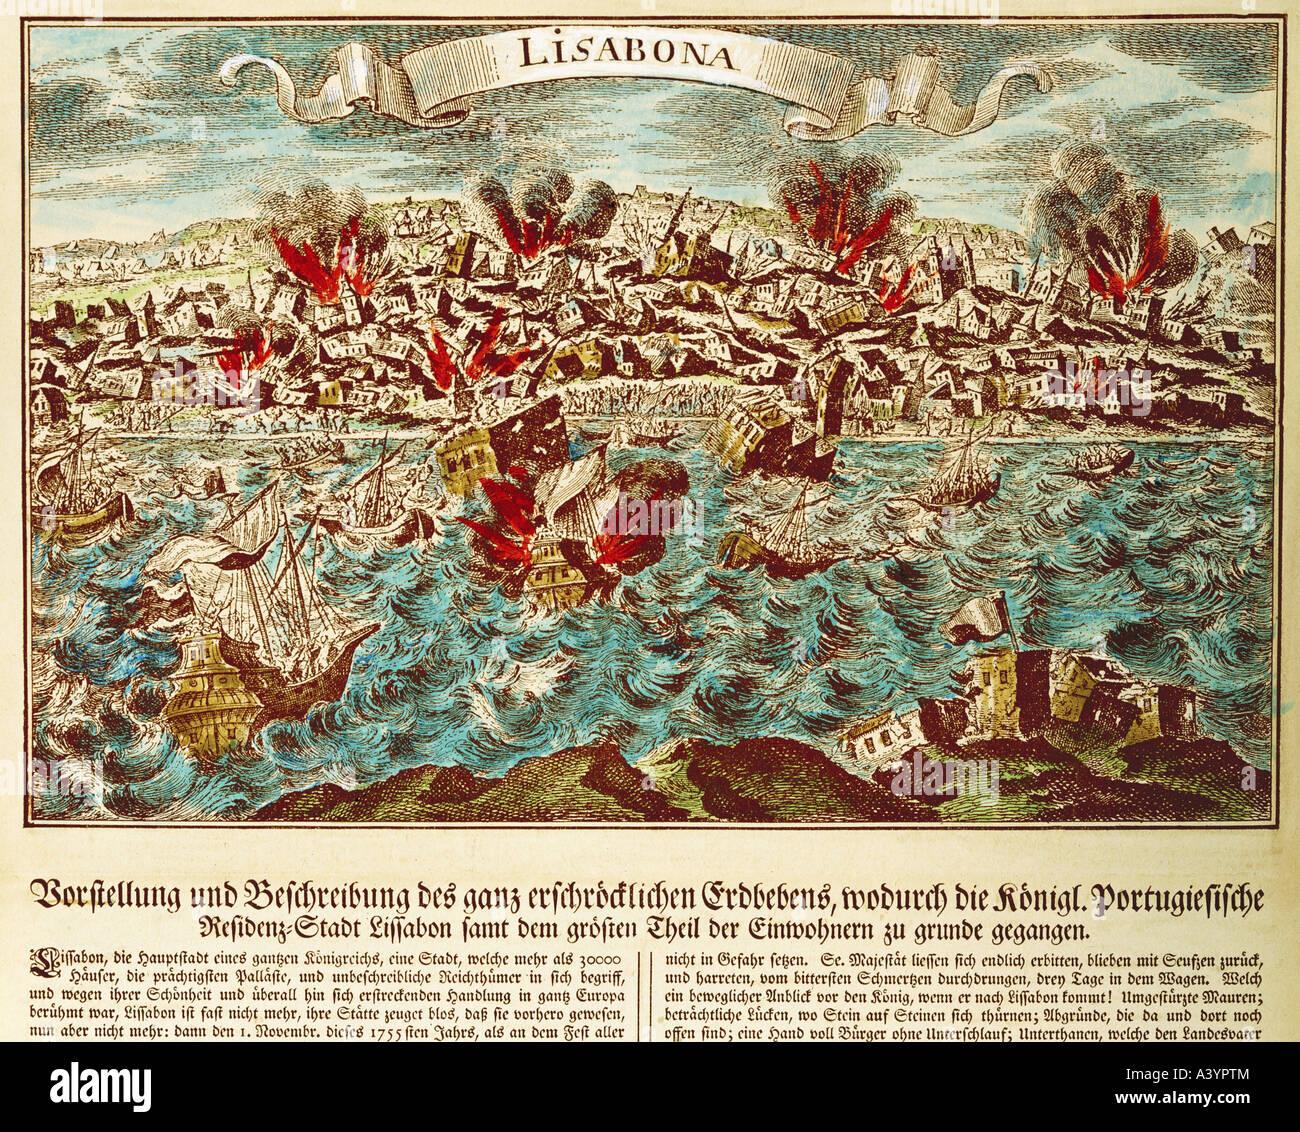 Desastre natural / catástrofe, terremoto, Lisboa, 1.11.1755, Copyright del artista no ha de ser borrado Foto de stock